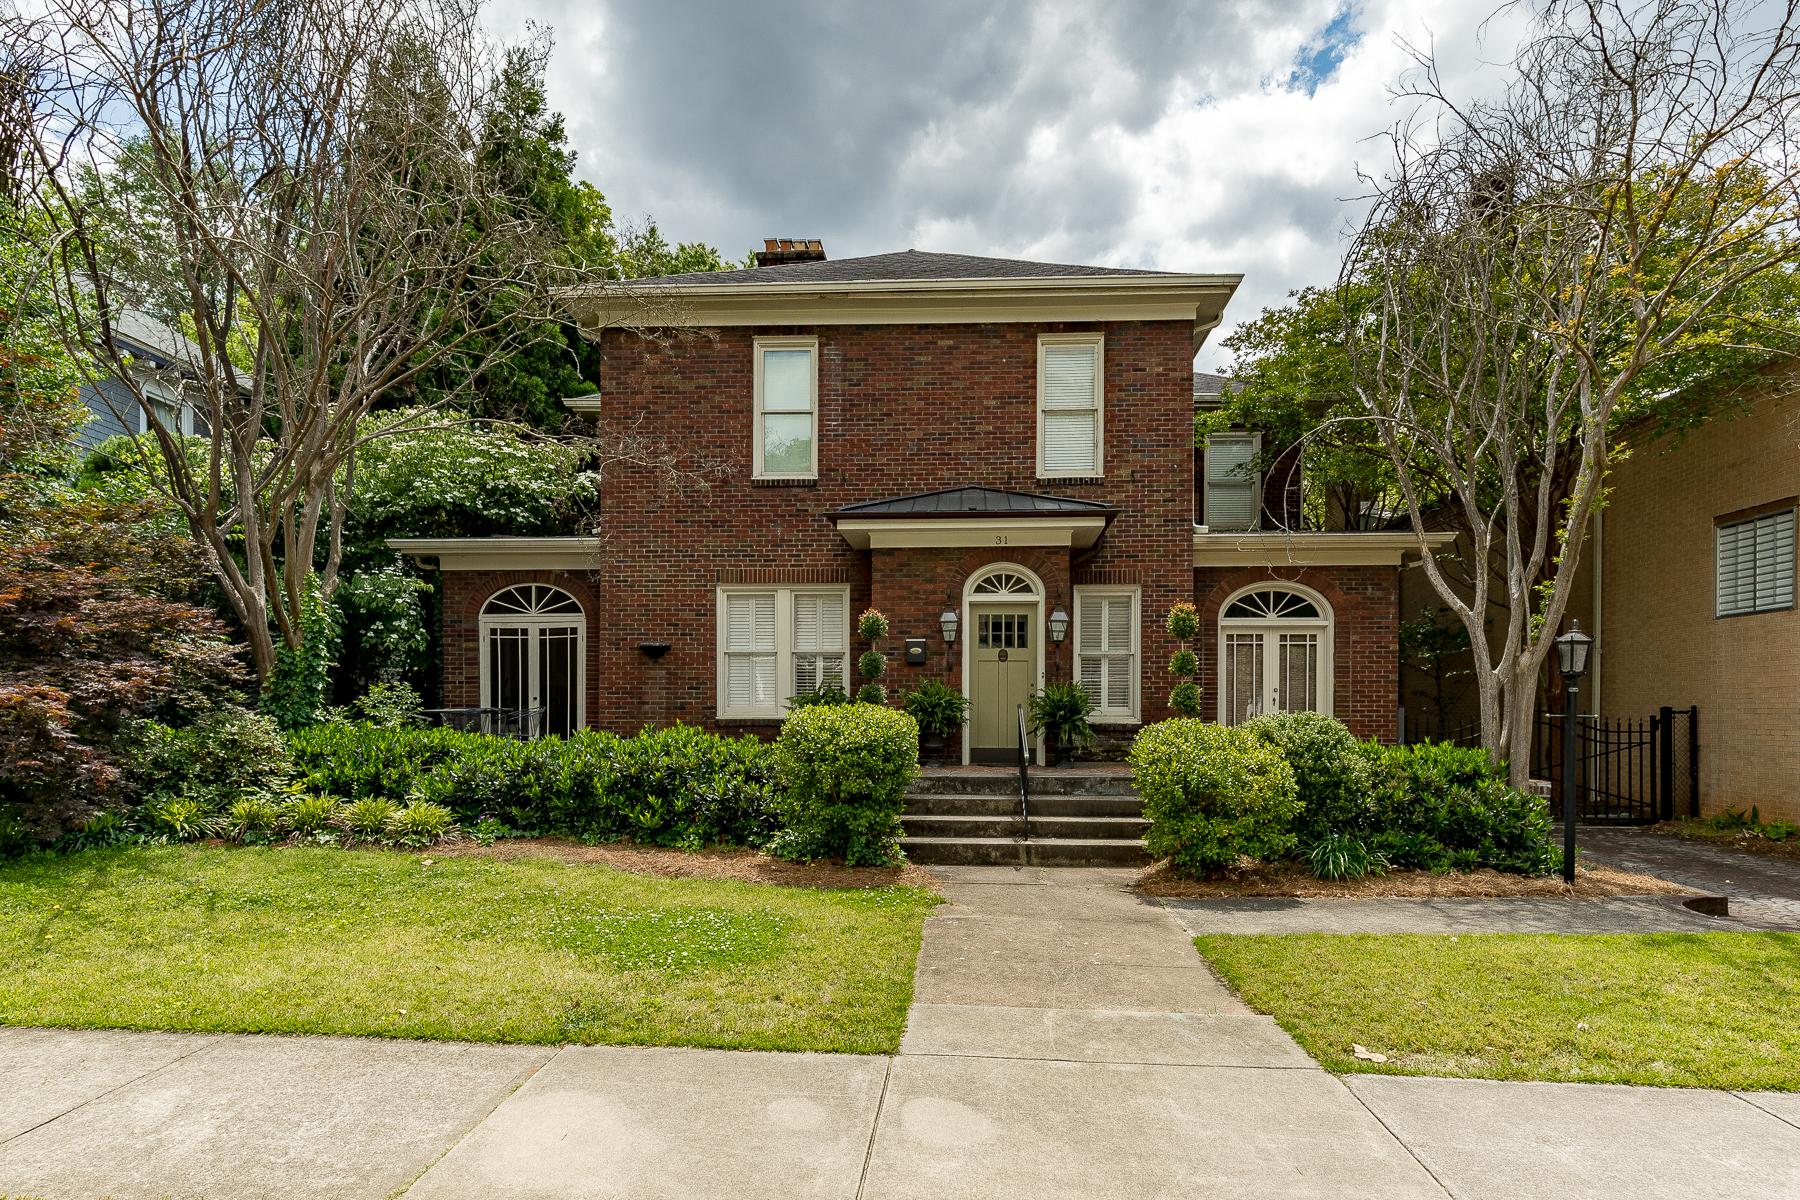 Single Family Homes for Sale at Fully renovated home in historic Hampton Pinckney! 31 Pinckney Street Greenville, South Carolina 29601 United States